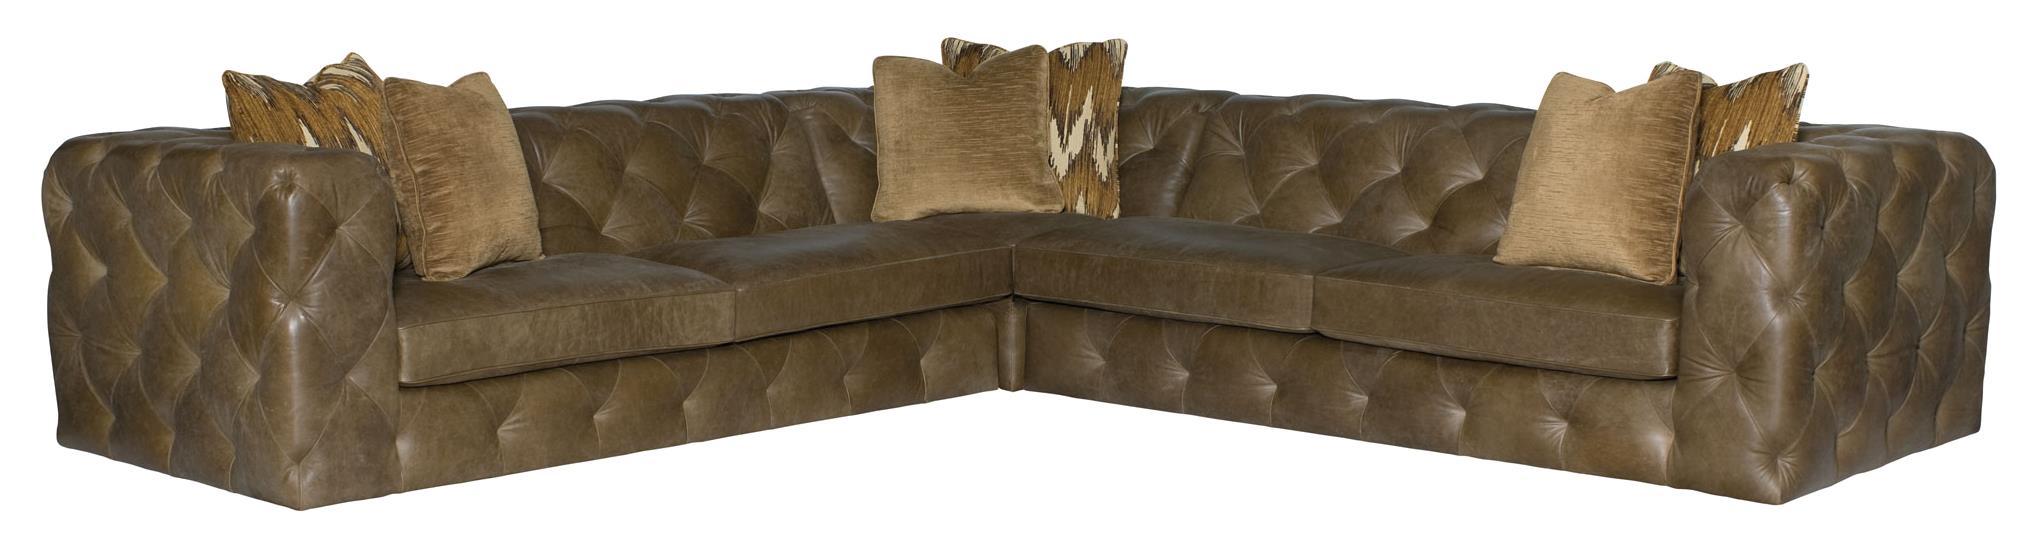 Bon Bernhardt ChelseaFour Seat Sectional Sofa ...